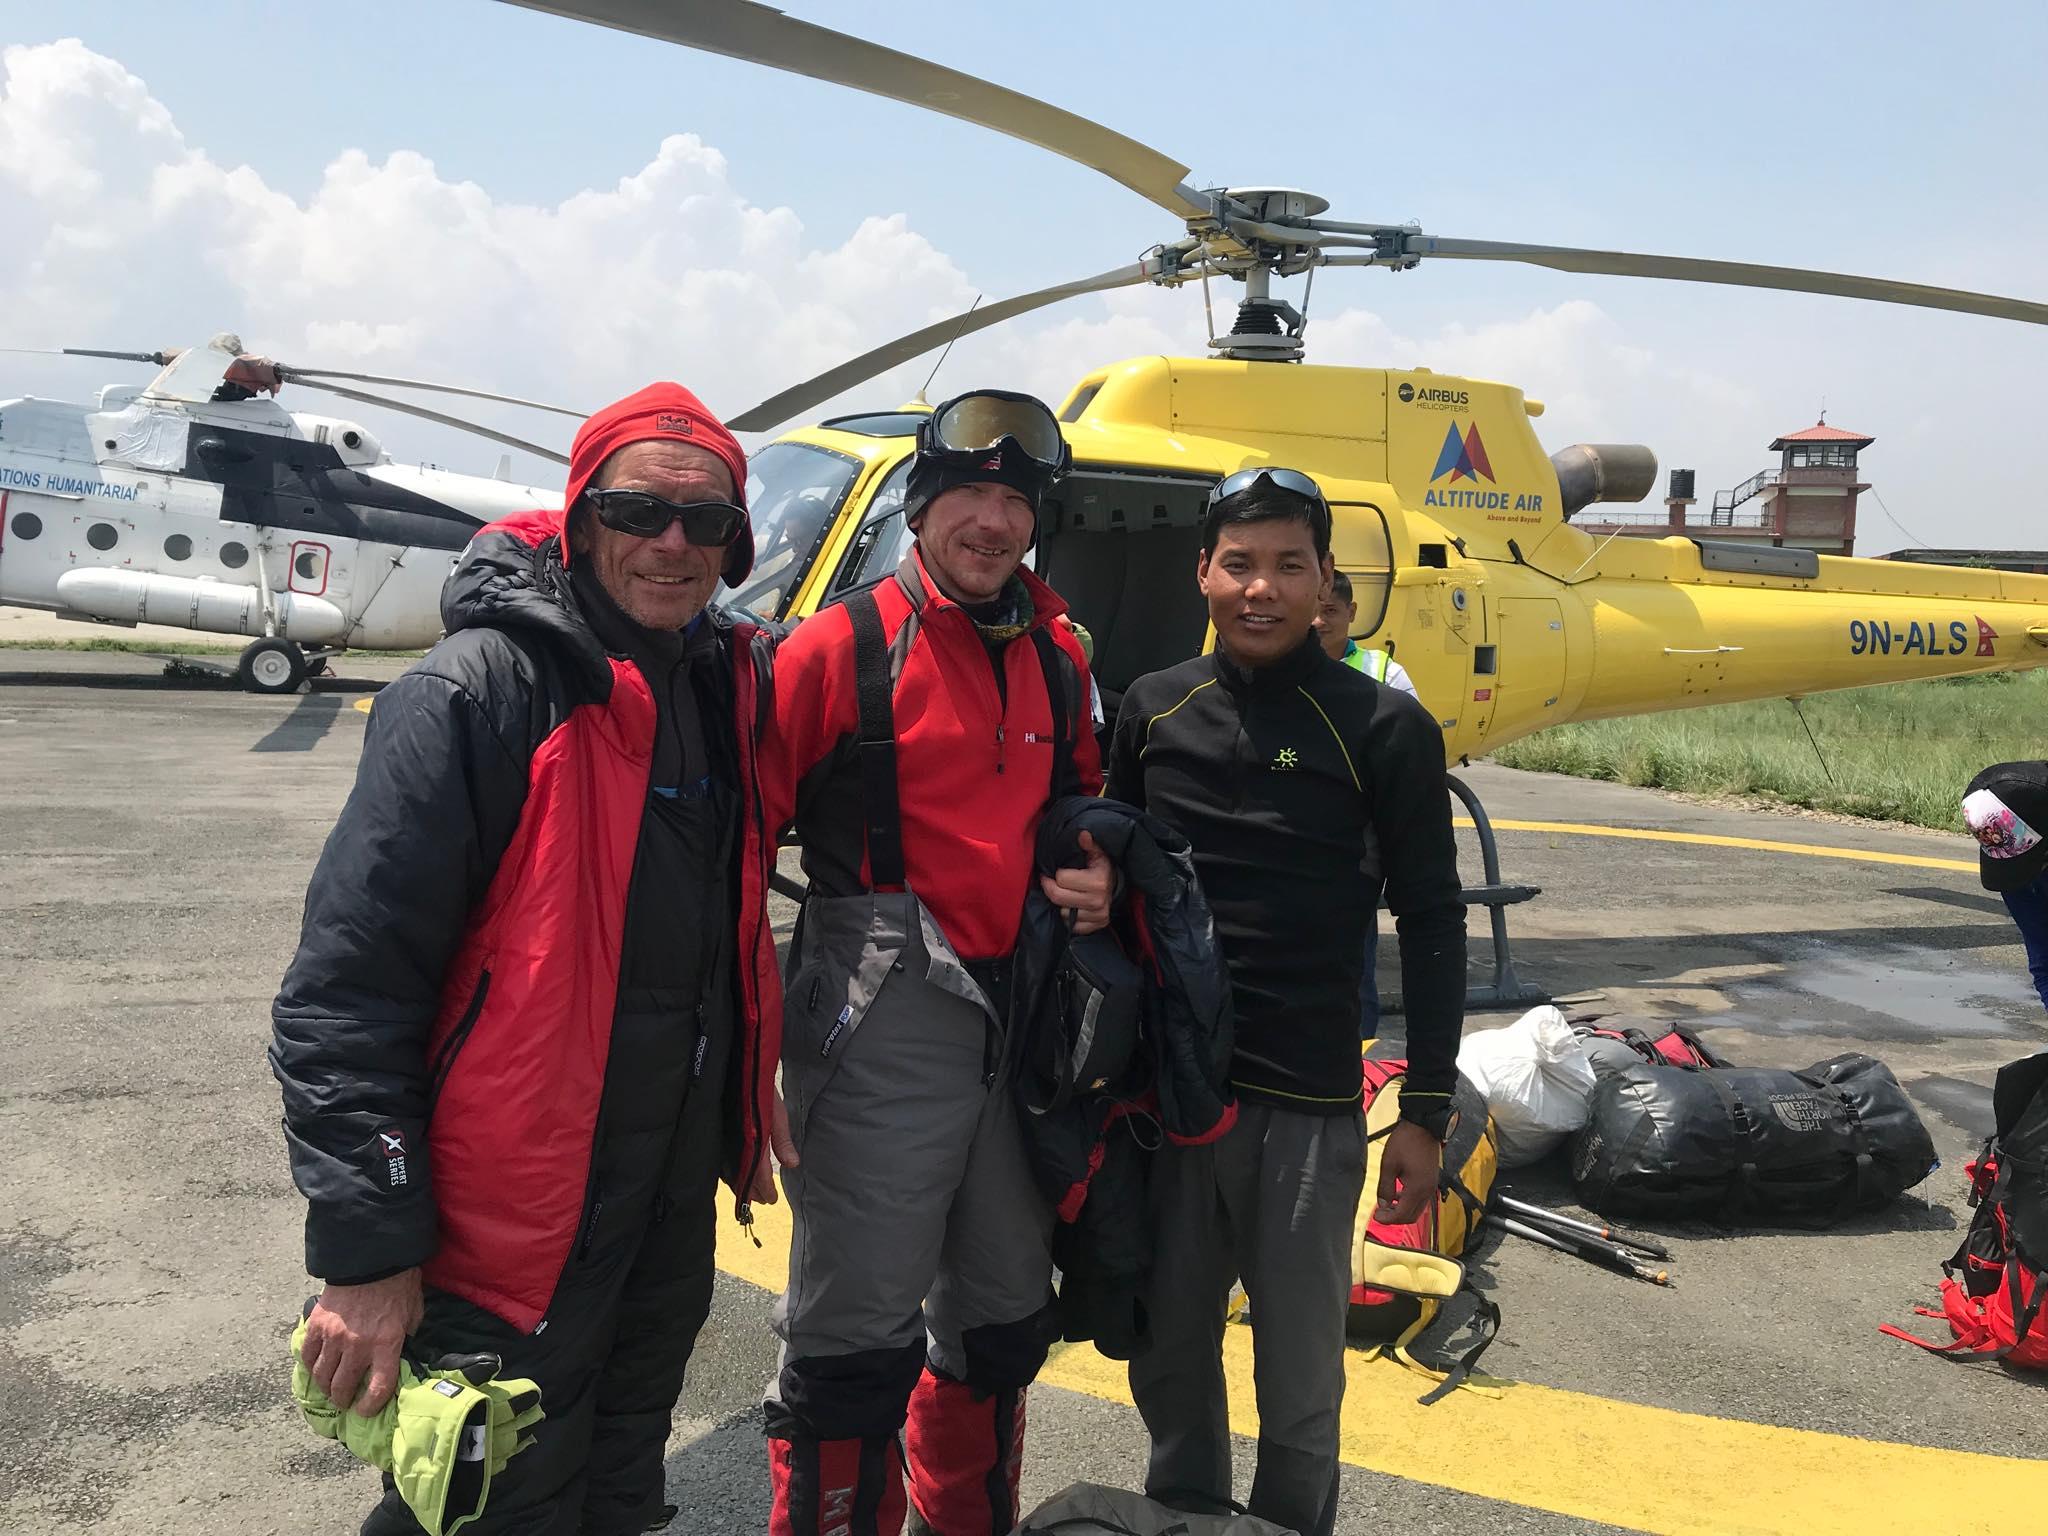 Lech Wieslaw Flaczynski and his son Wojciech Bartlomiej Flaczynski along with a climbing Sherpa at Tribhuvan International Airport. Photo: Mingma Sherpa